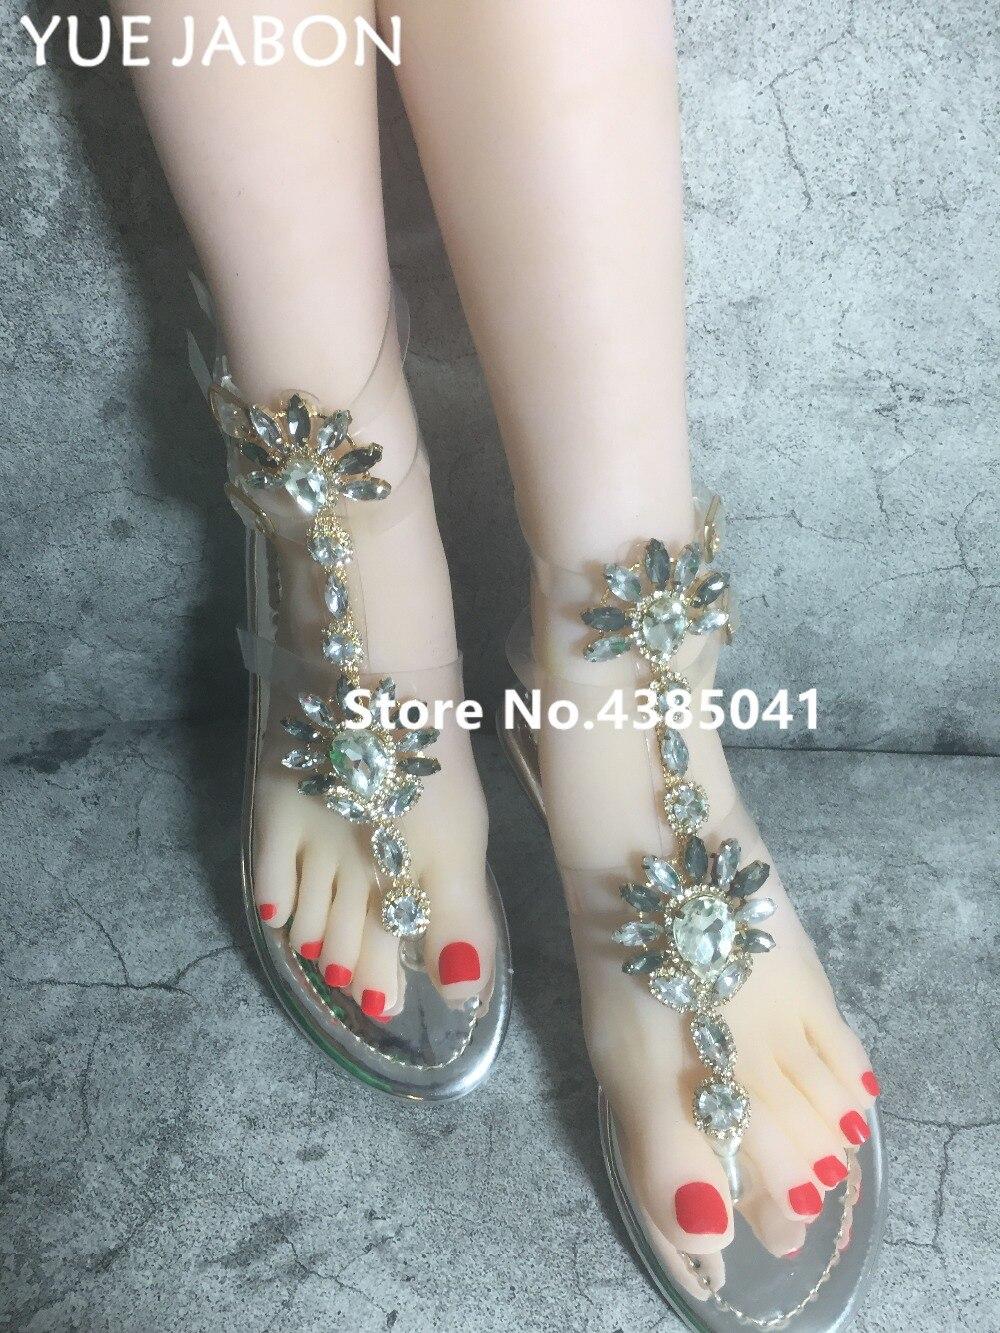 HTB1KvMZAoR1BeNjy0Fmq6z0wVXaT 2019 Woman Sandals Women Shoes Rhinestones Gladiator Flat Sandals Crystal Chaussure Plus Size 43 tenis feminino Green Flip Flops